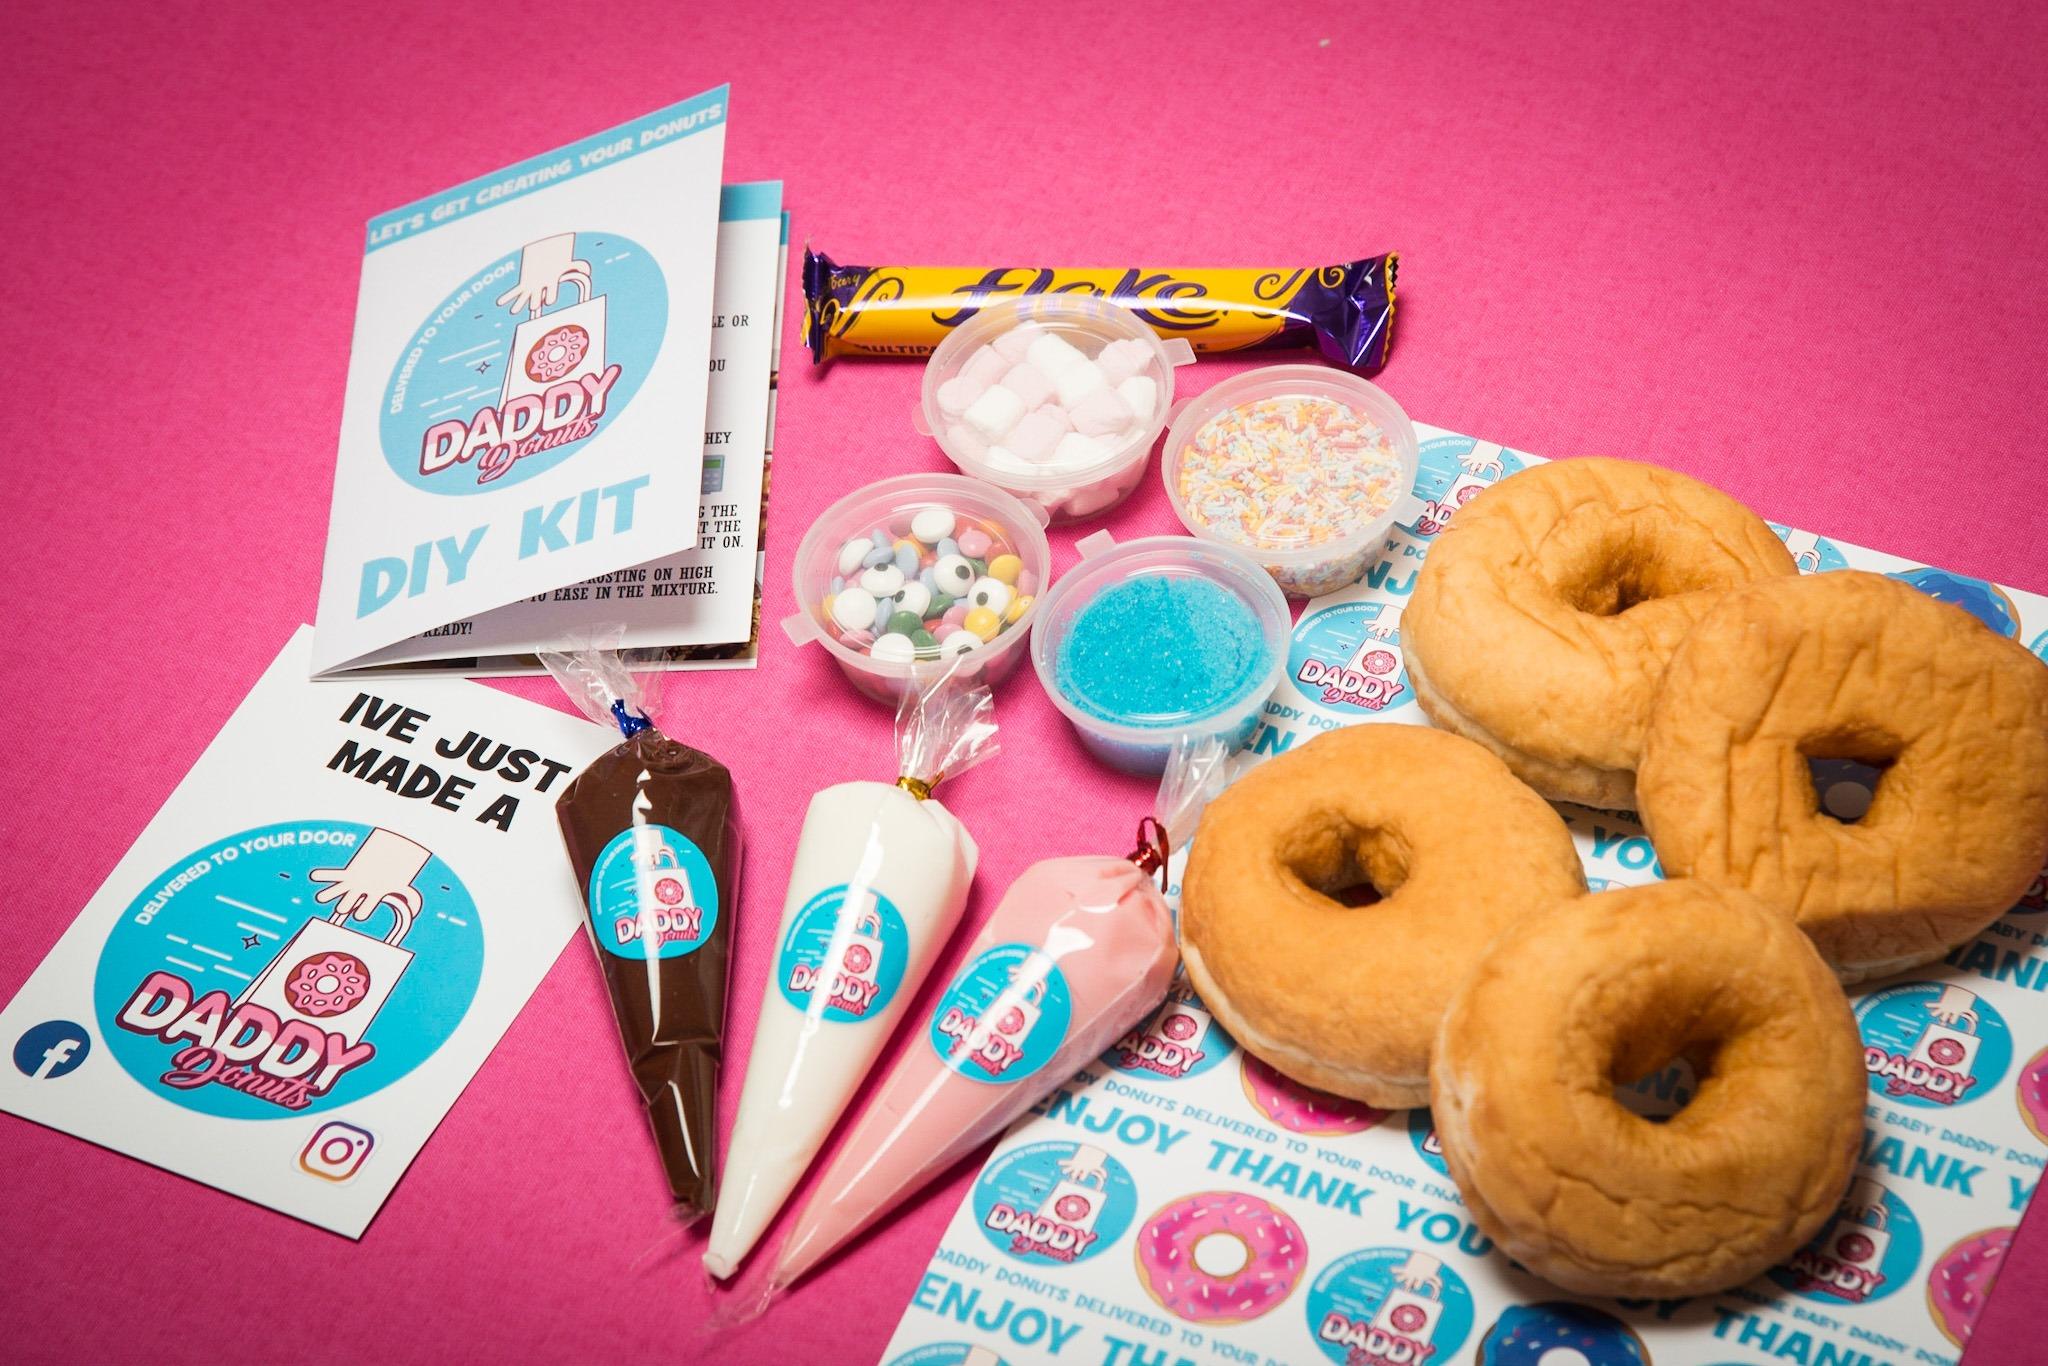 doughnuts delivered to your door